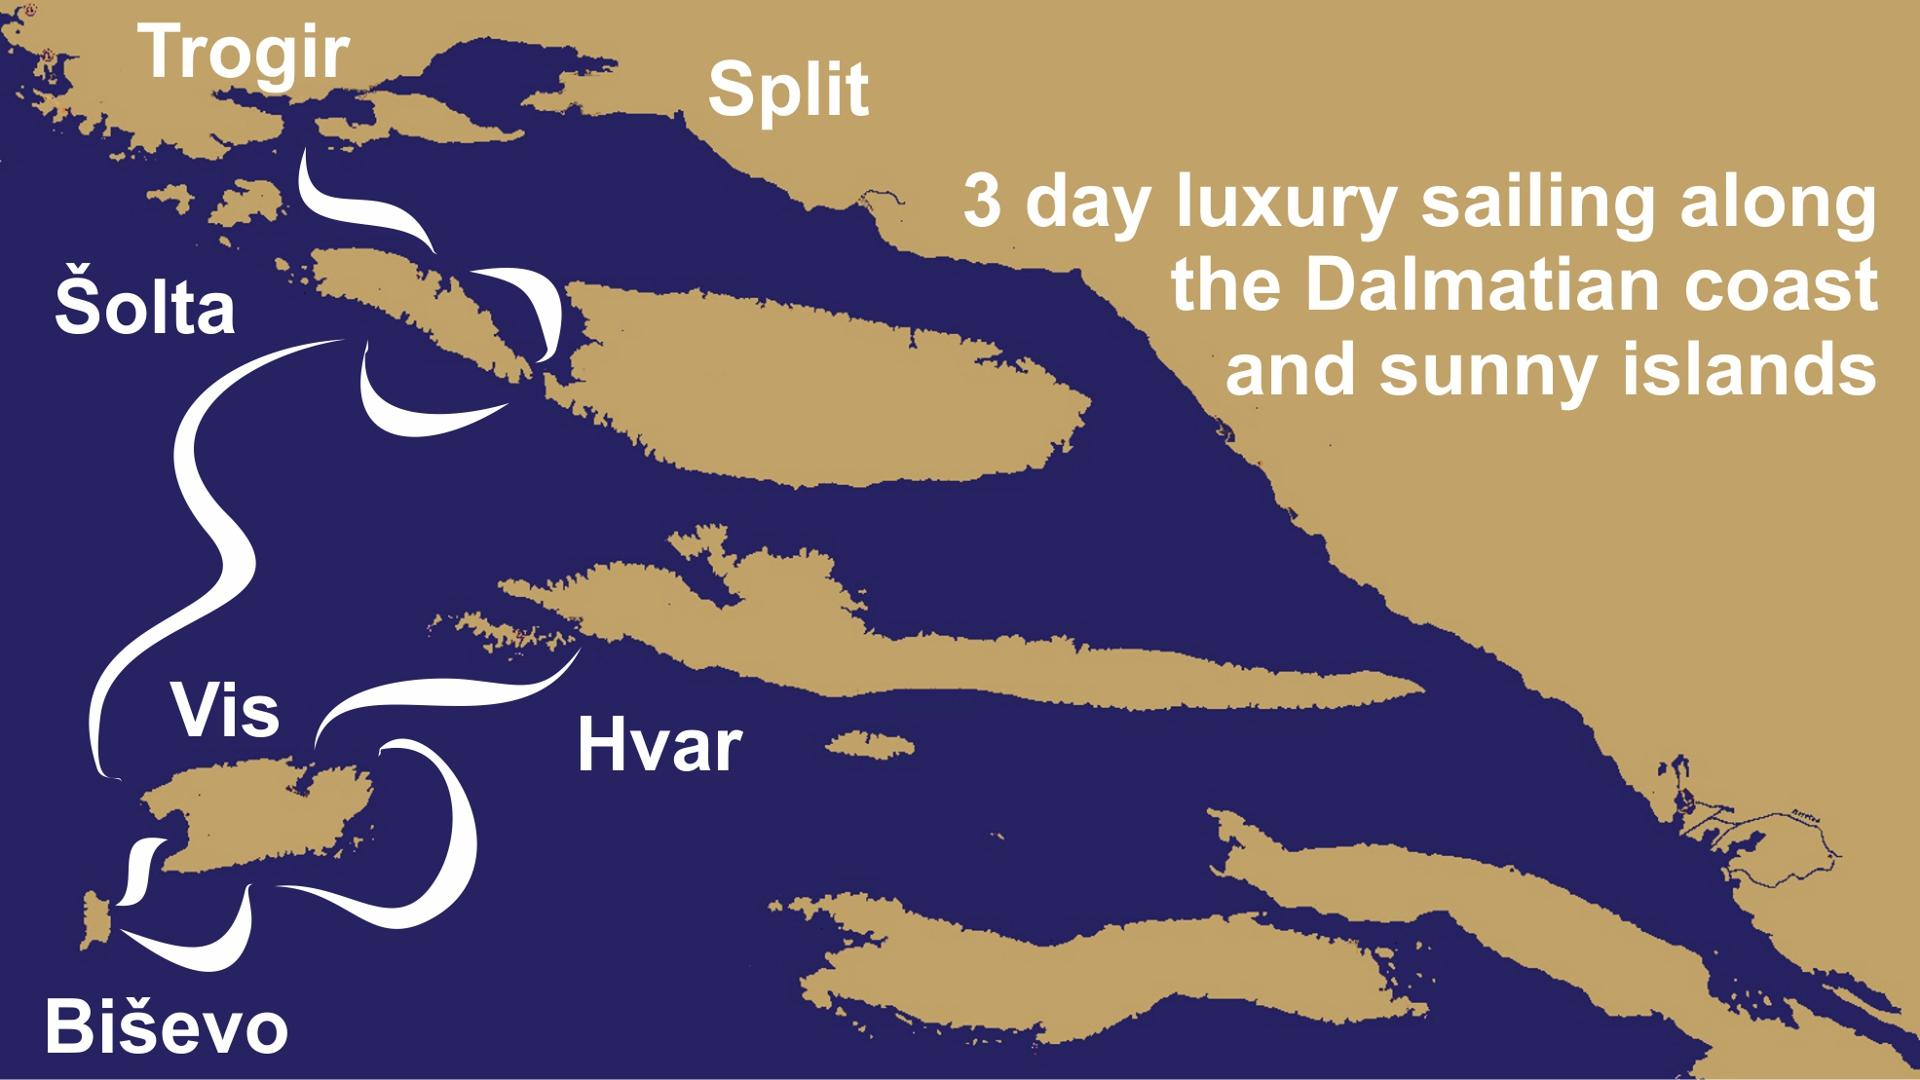 3 day luxury sailing along the Dalmatian coast and sunny islands